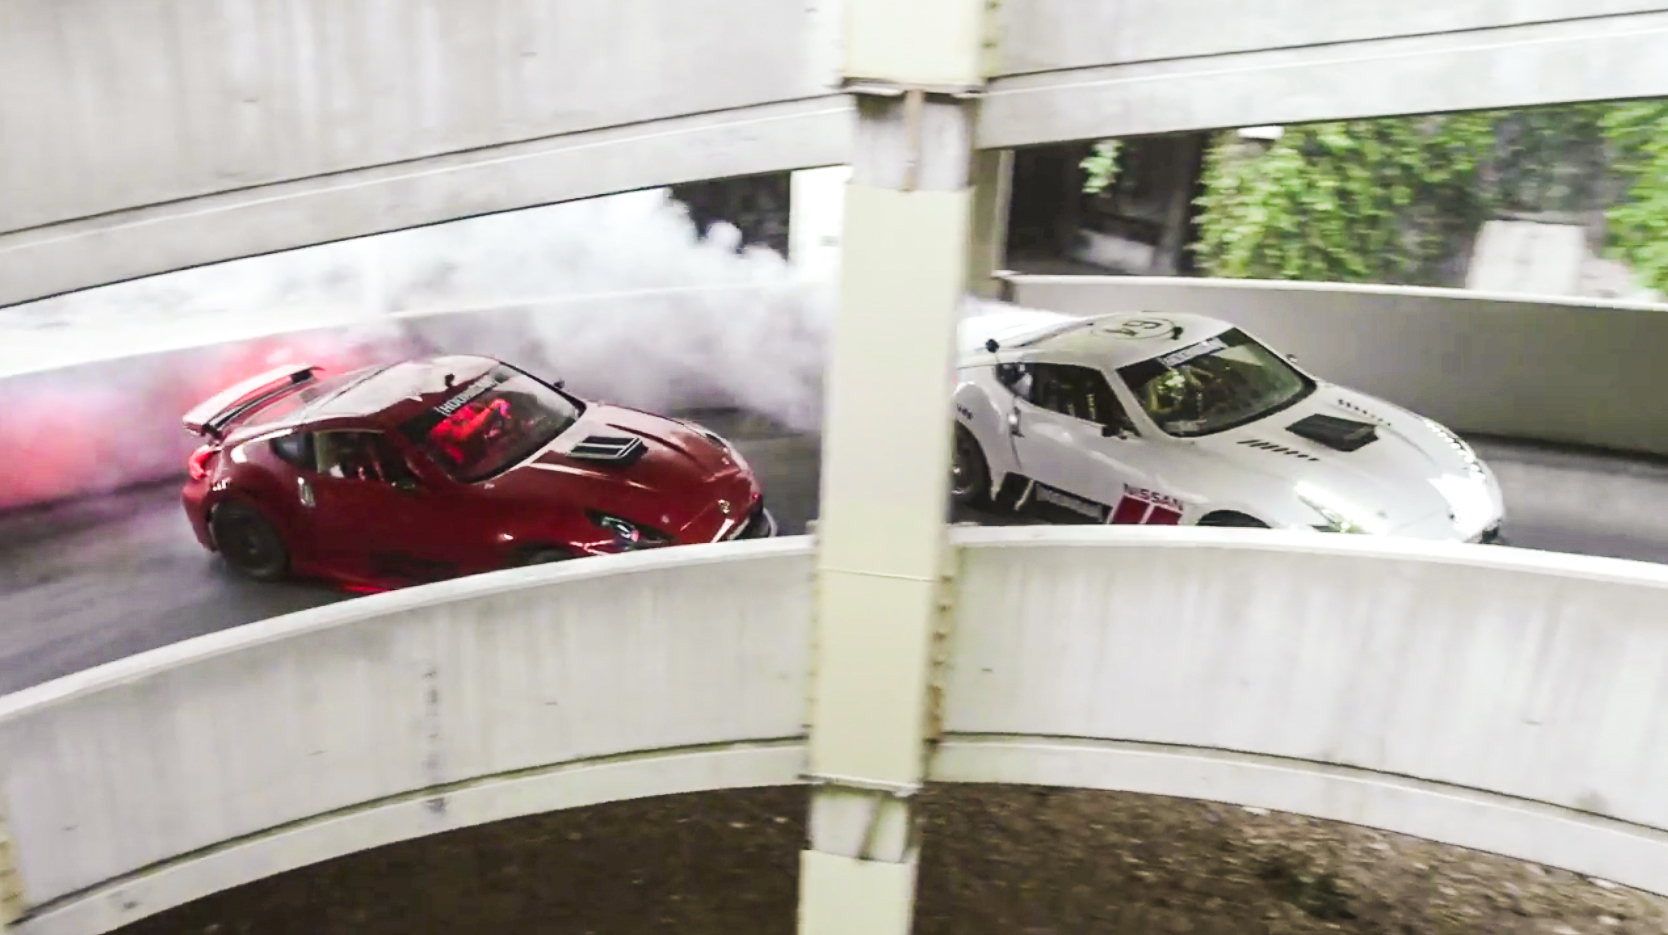 Zwei Profi-Drifter gehen mit 1.000 PS starken Nissan 370Z ans Limit